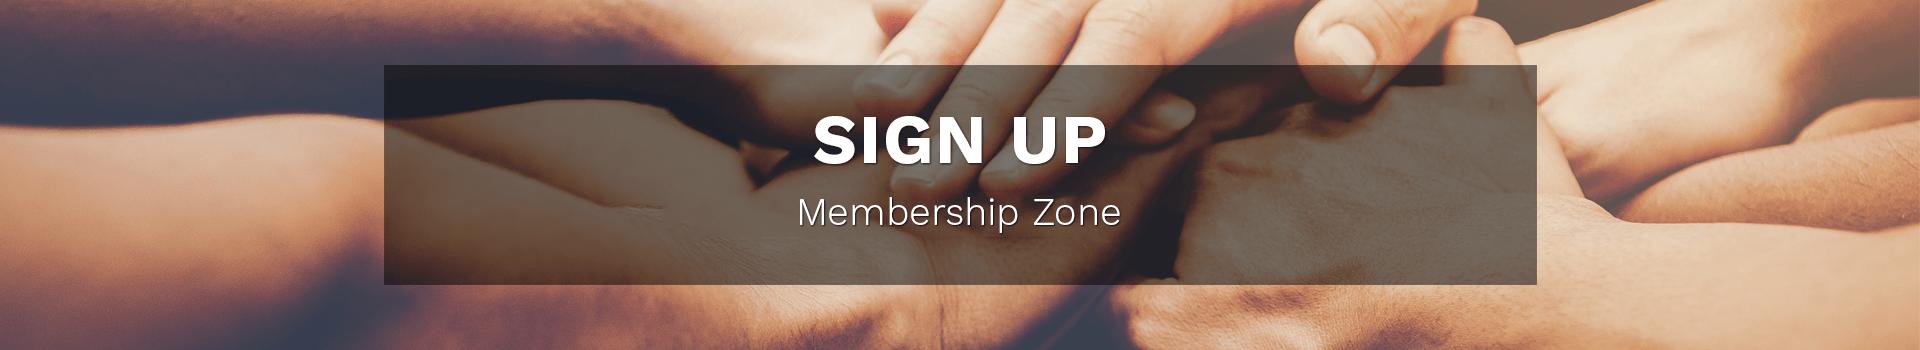 membership zone